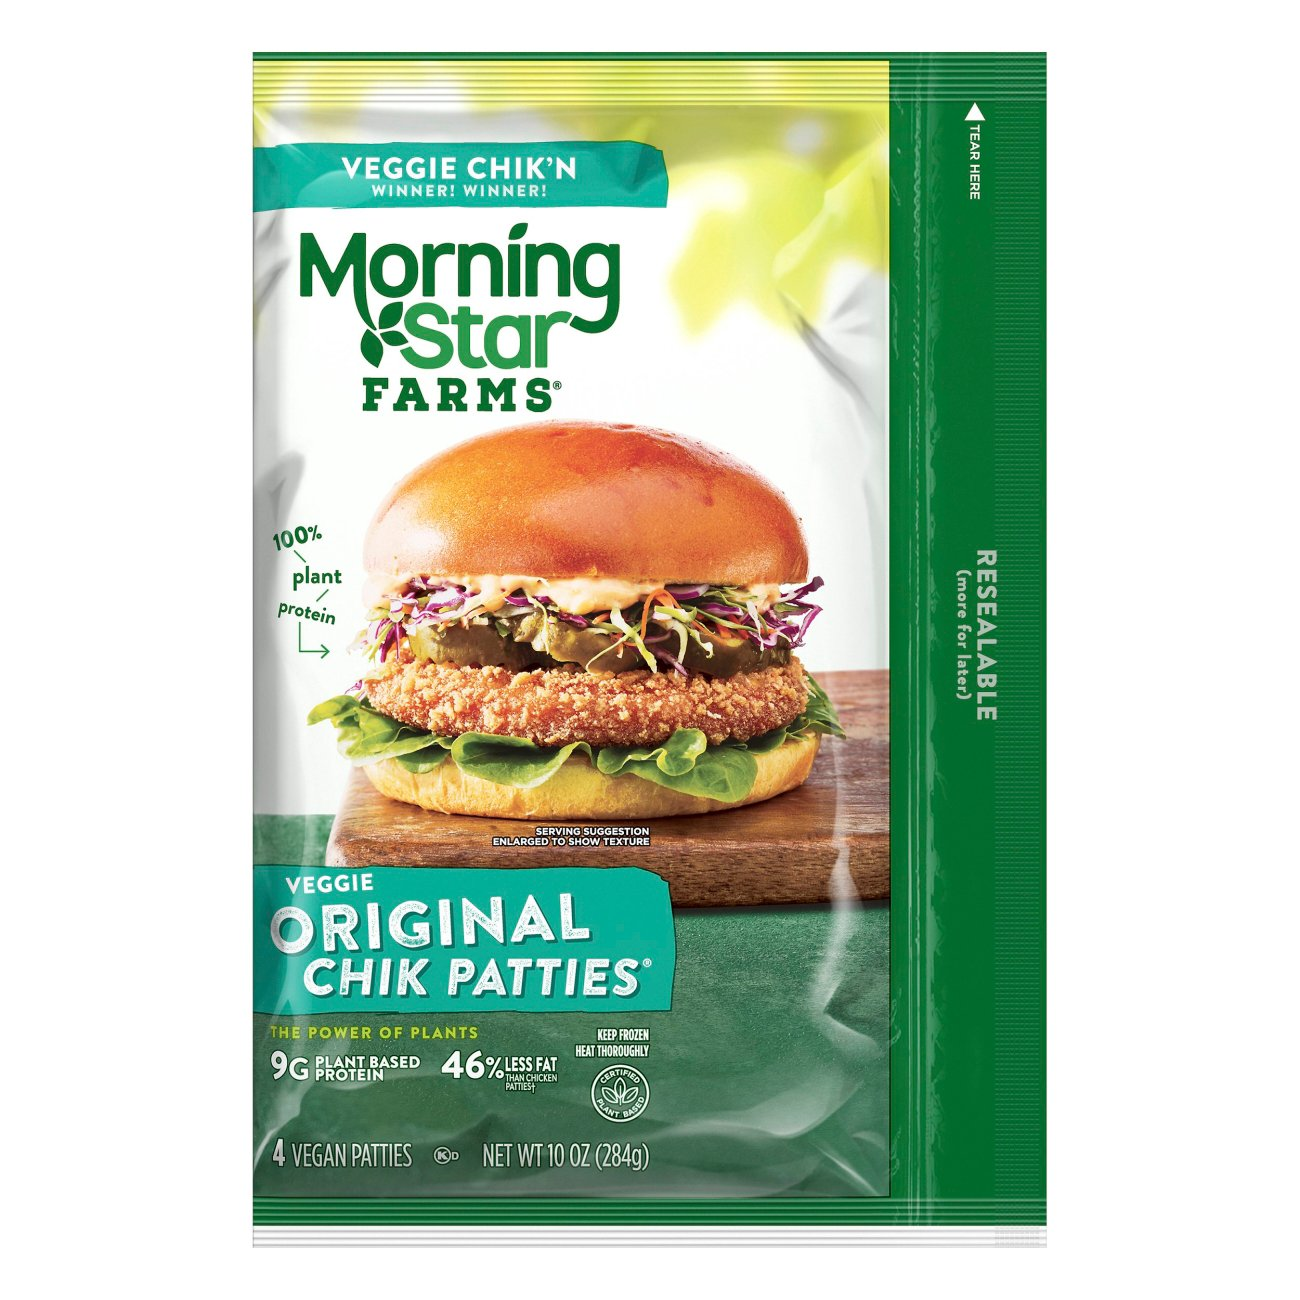 Morningstar Farms Original Chik Veggie Patties Shop Meat Alternatives At H E B